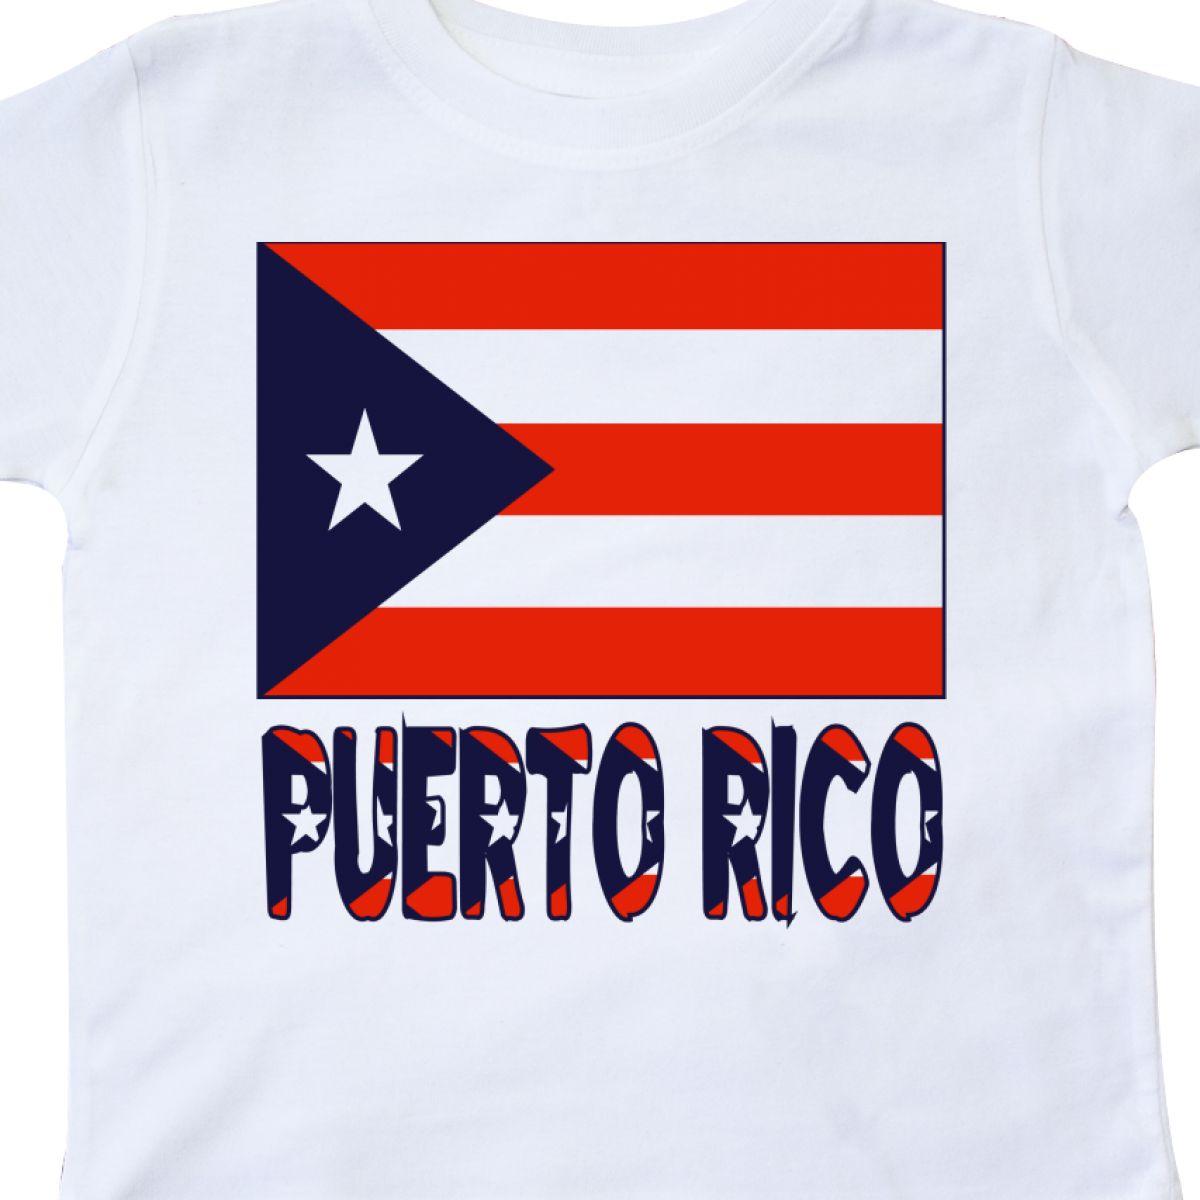 Inktastic-Puerto-Rico-Flag-amp-Name-Toddler-T-Shirt-Puerto-rican-Puerto-rico-Gift thumbnail 10